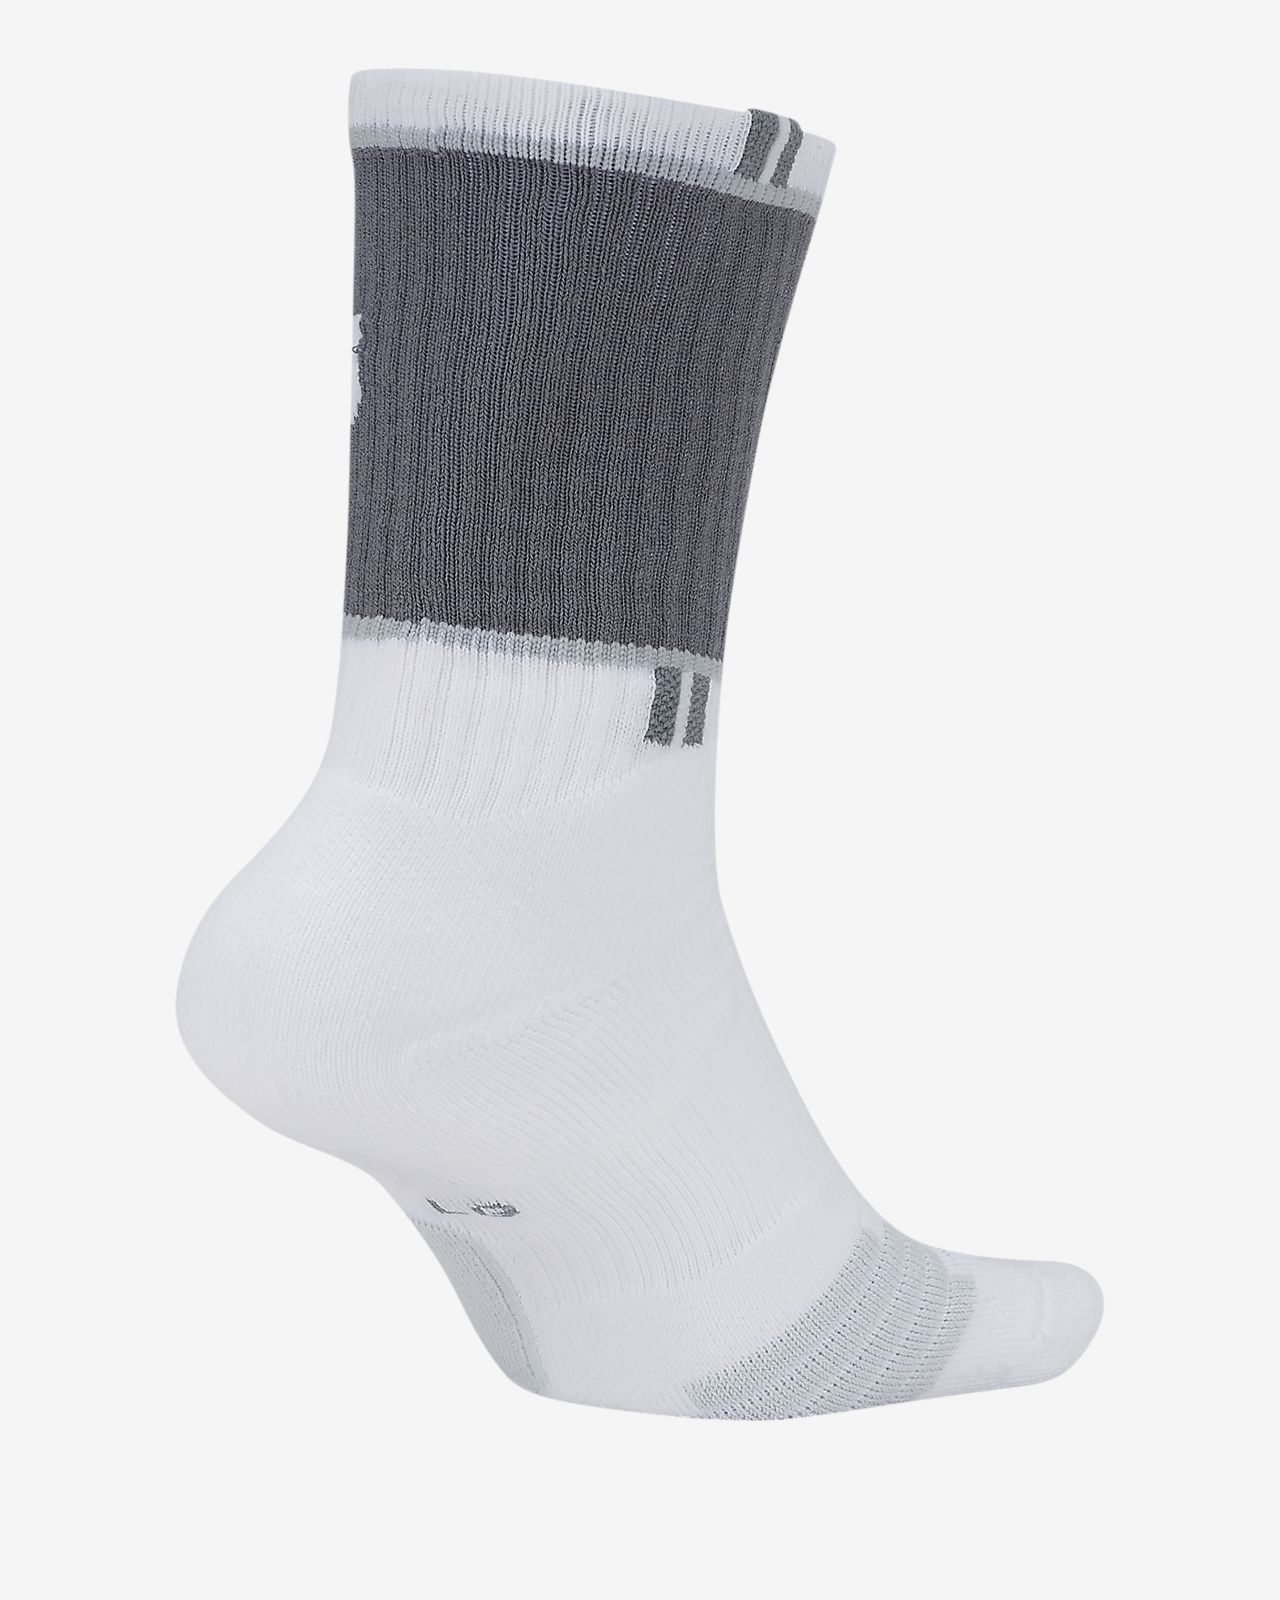 KD Elite 籃球中筒襪 (1 雙)